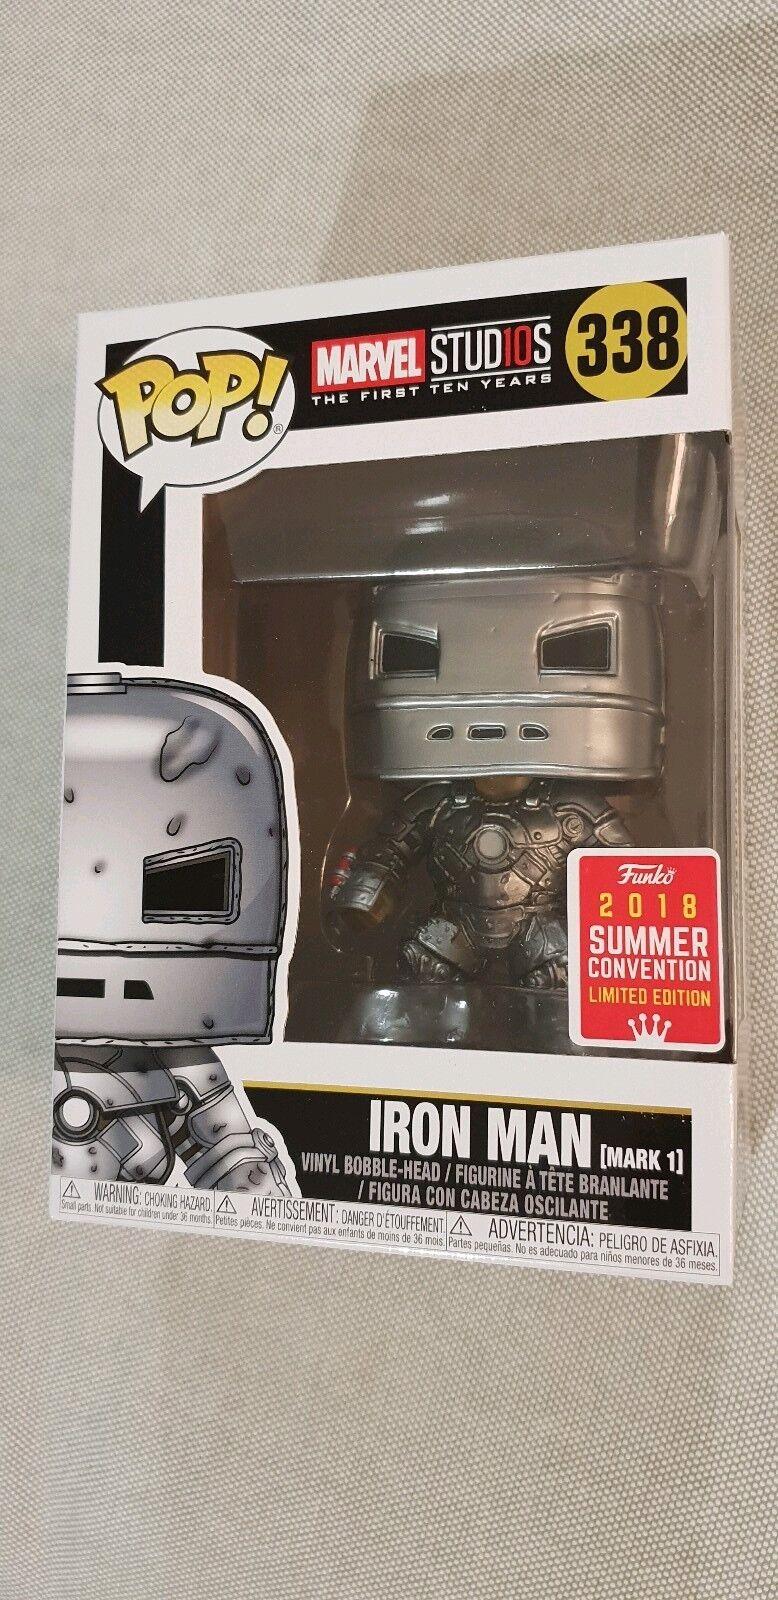 Funko Pop Iron Man ( Mark 1 ) 338 sdcc 2018 Marvel Studios The First Ten Years